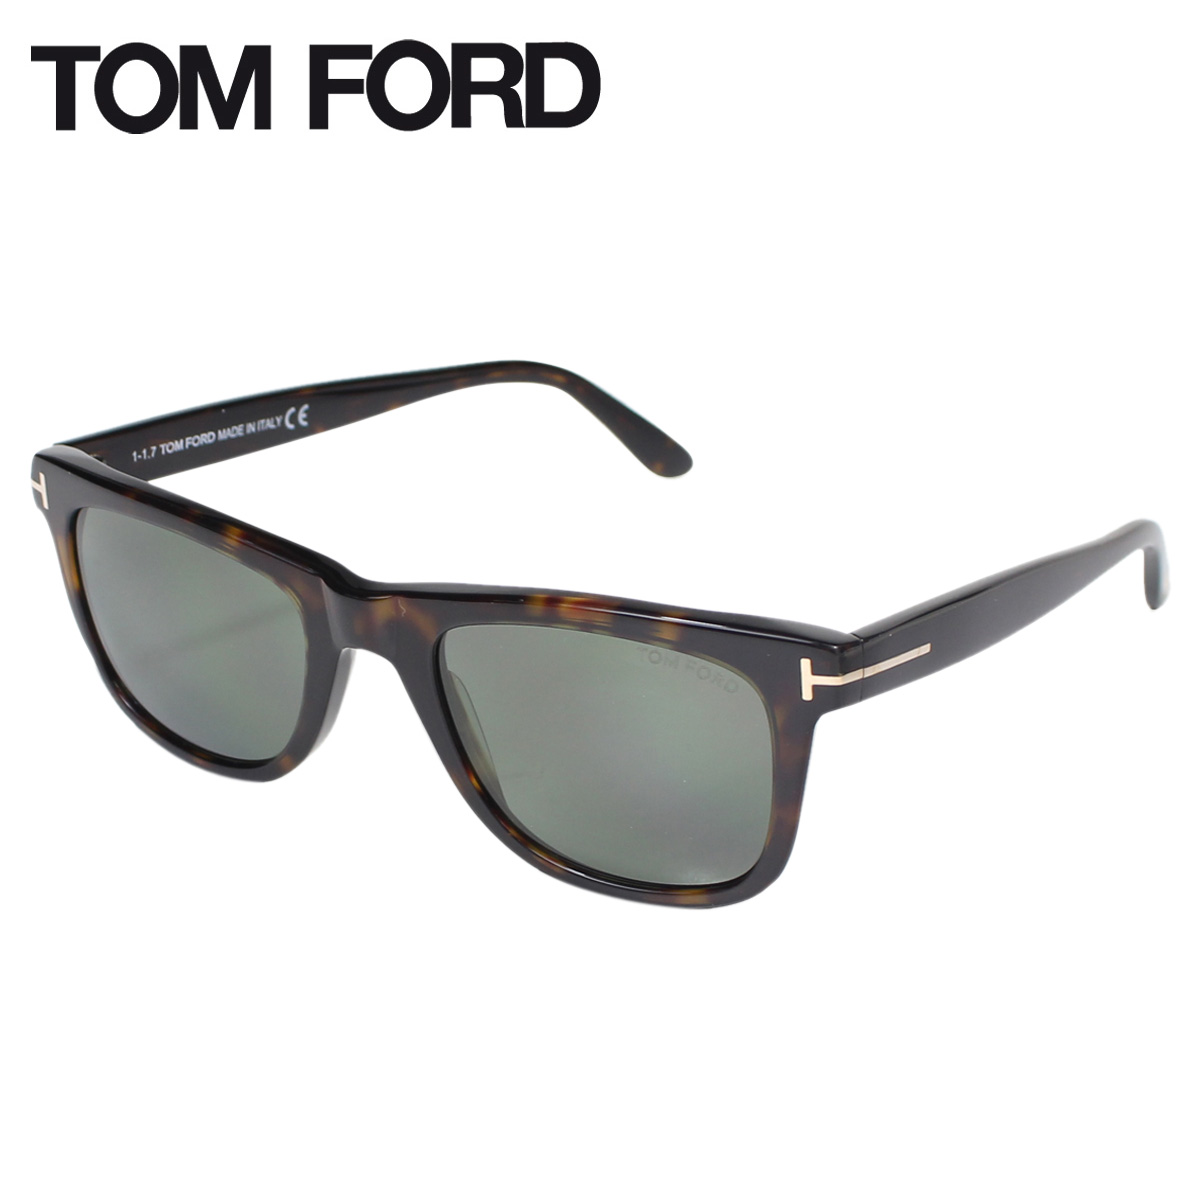 dfa54a2c8df Allsports tom ford tom ford sunglasses glasses men gap dis eyewear jpg  1200x1200 Tom ford glasses